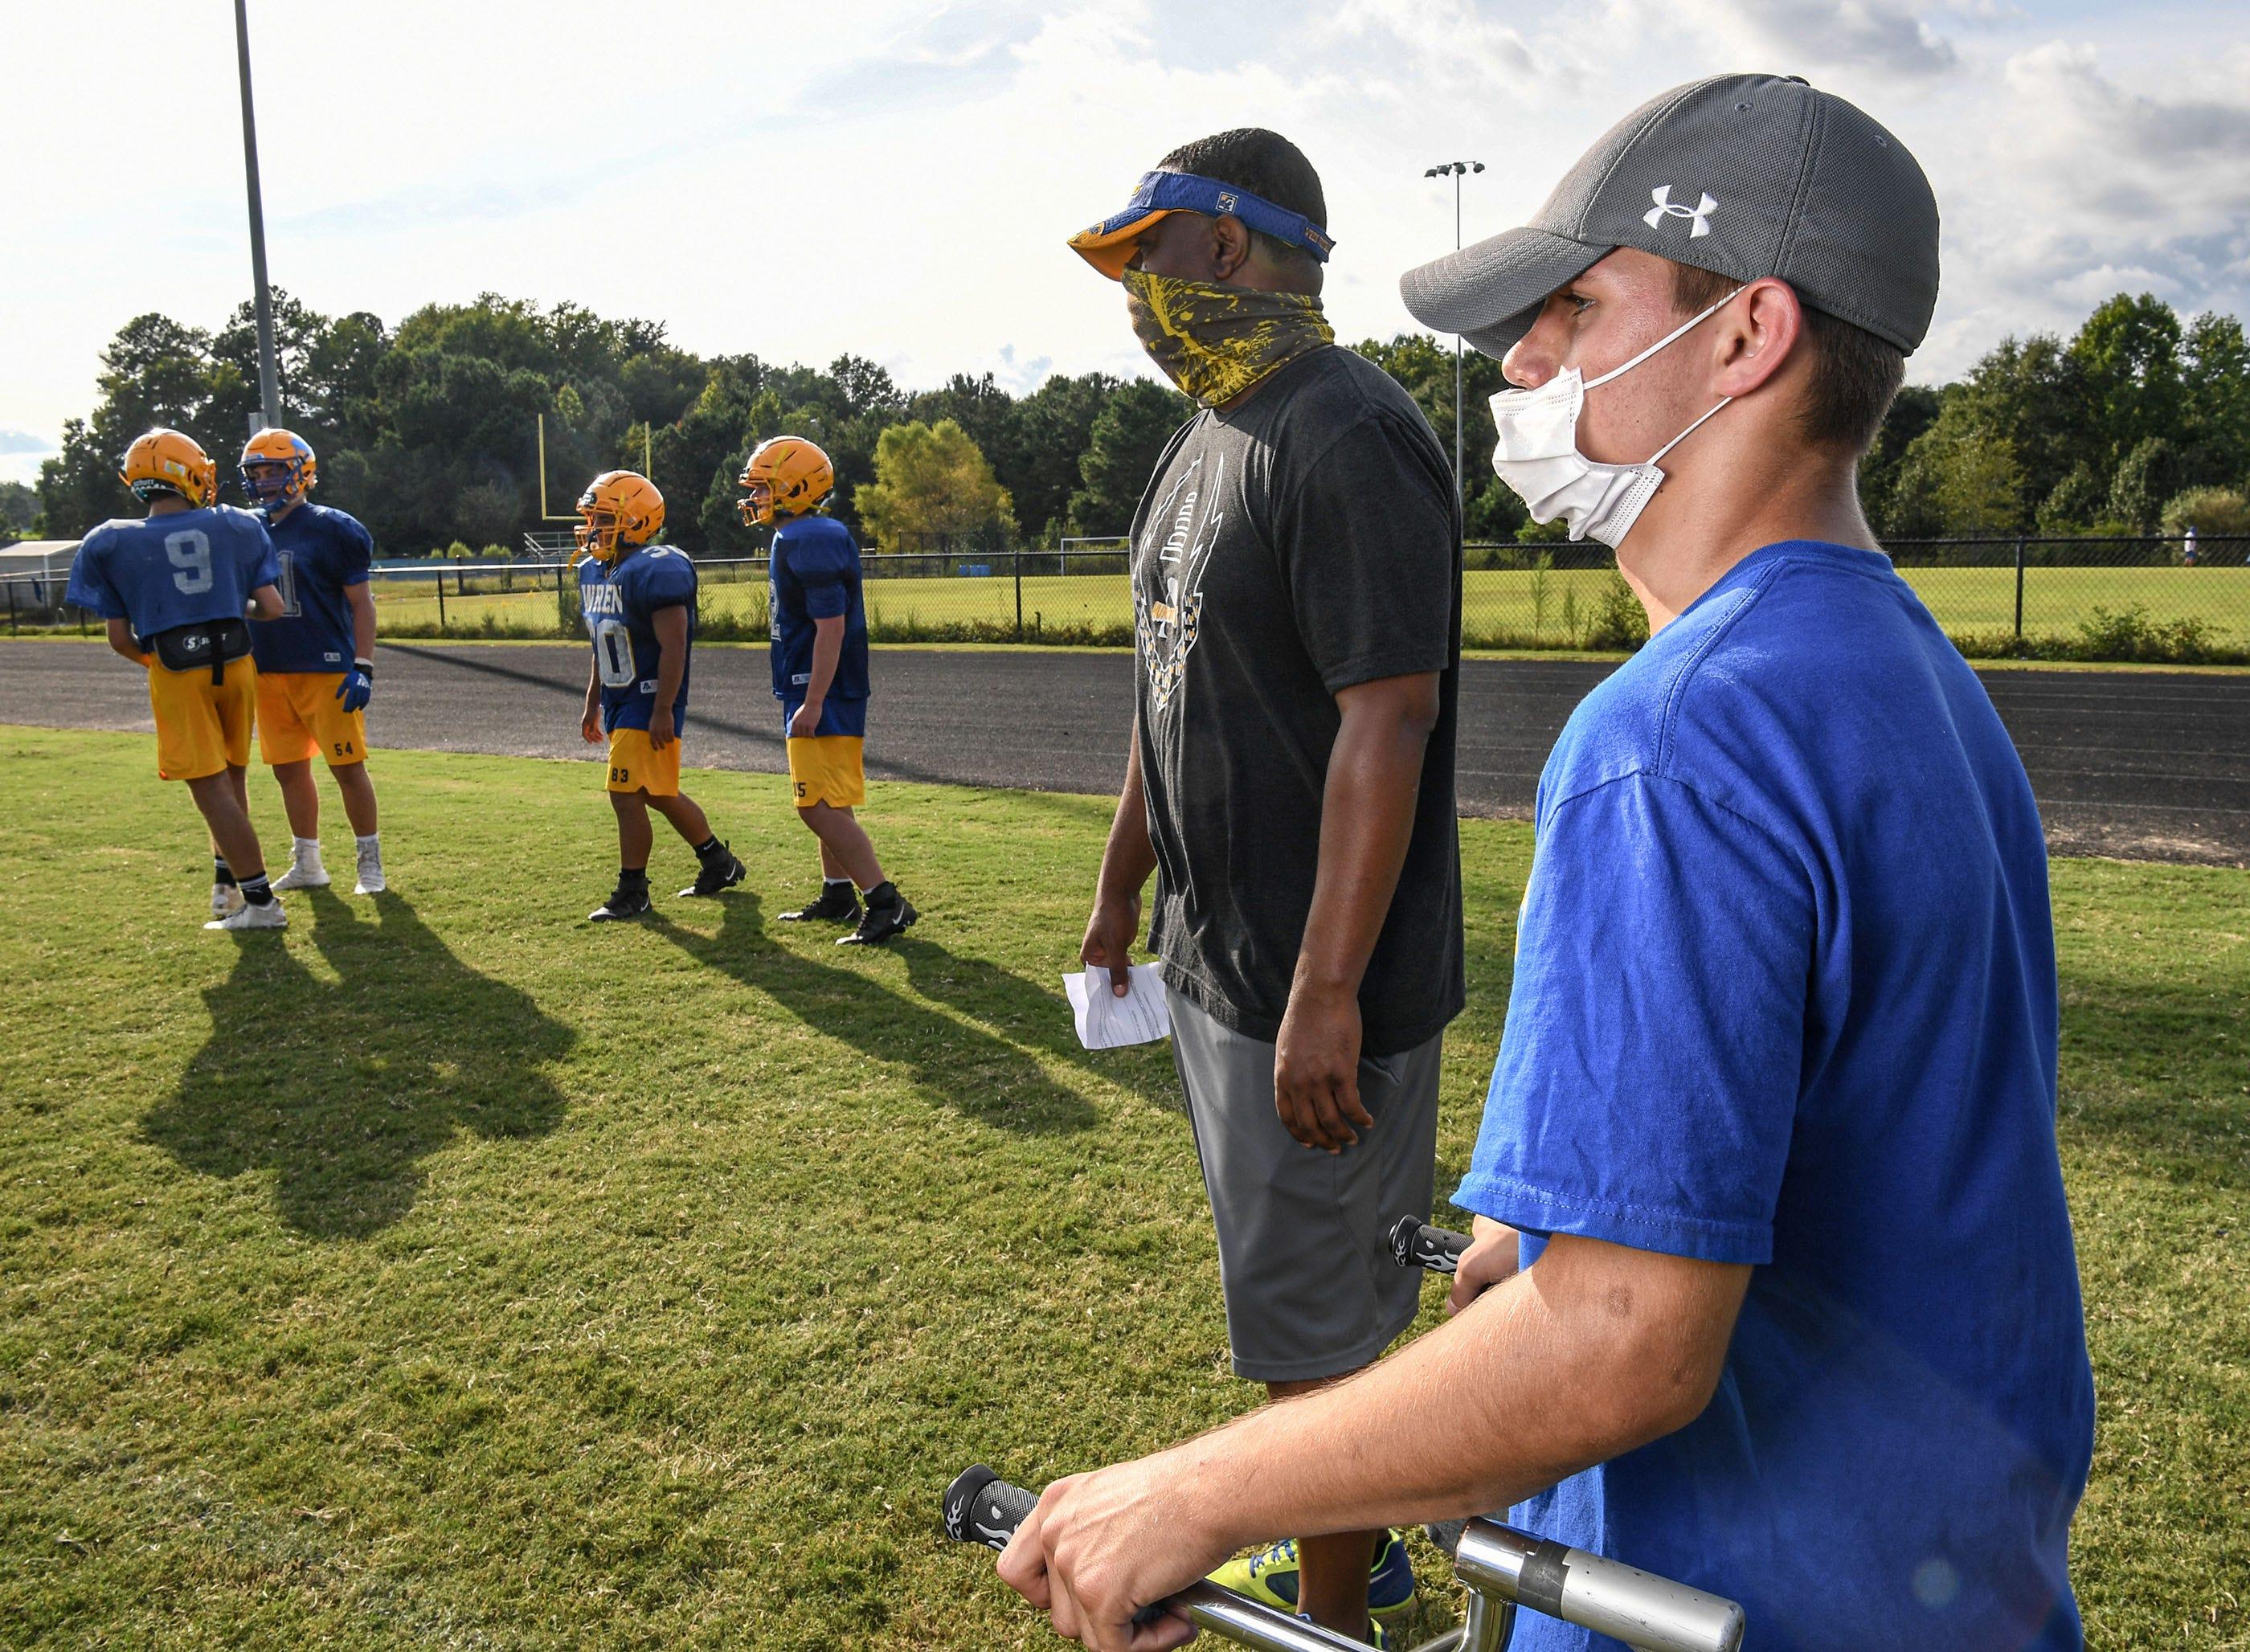 Wren football team manager Connor Monteruil watches over practice in Piedmont, S.C. September 2020.